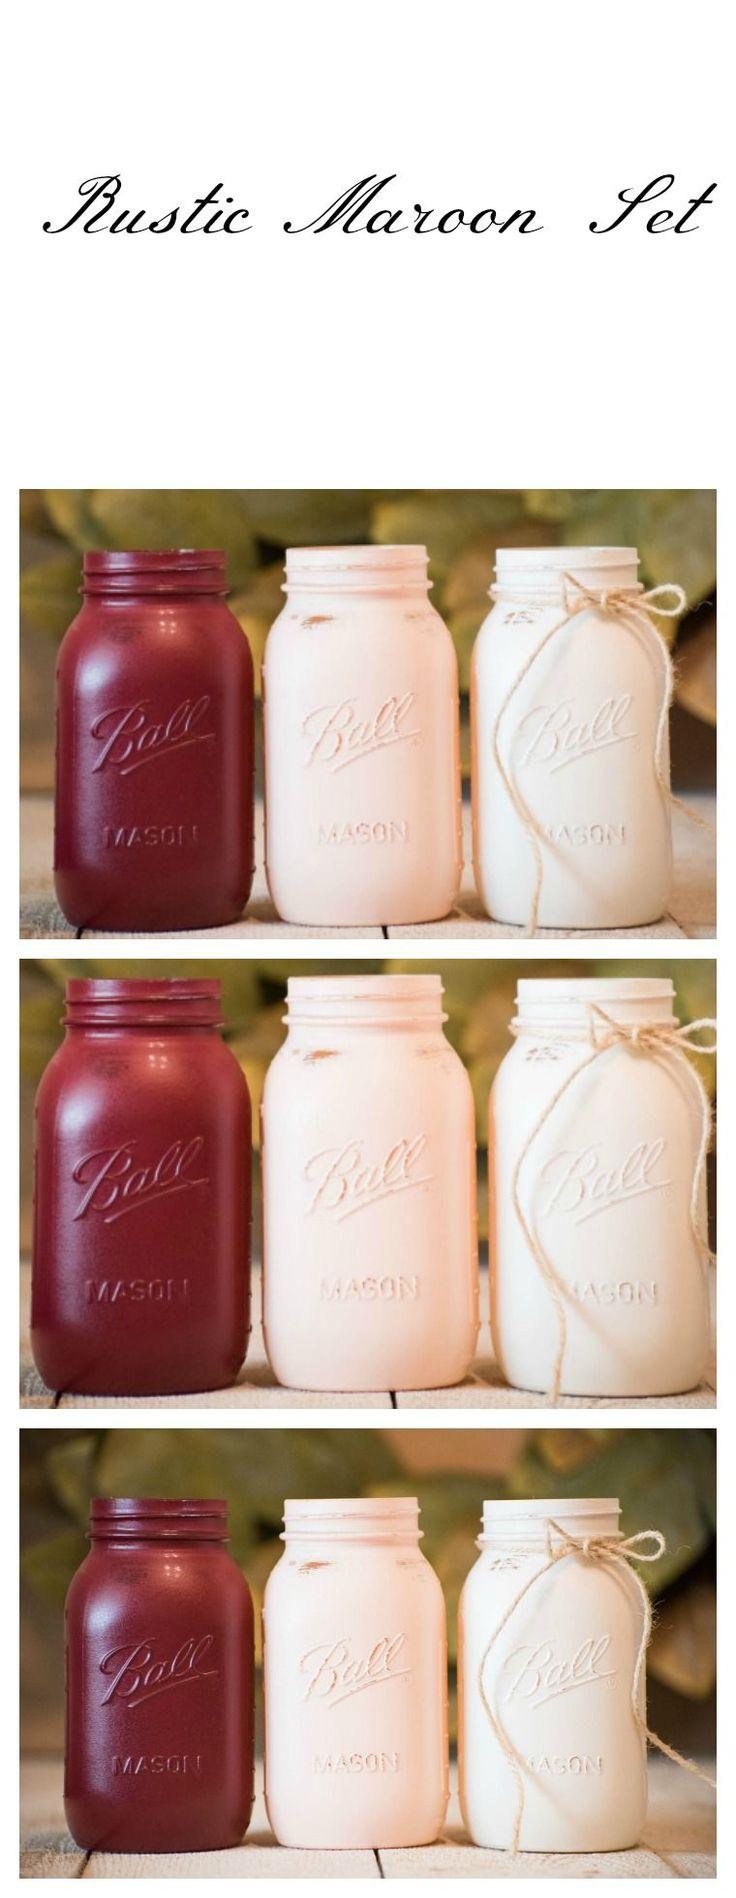 Mason Jar Wedding Centerpiece. Rustic Maroon and Peach Decor. Vase. Farmhouse Rustic Chic. Modern Design. Katiebluechic